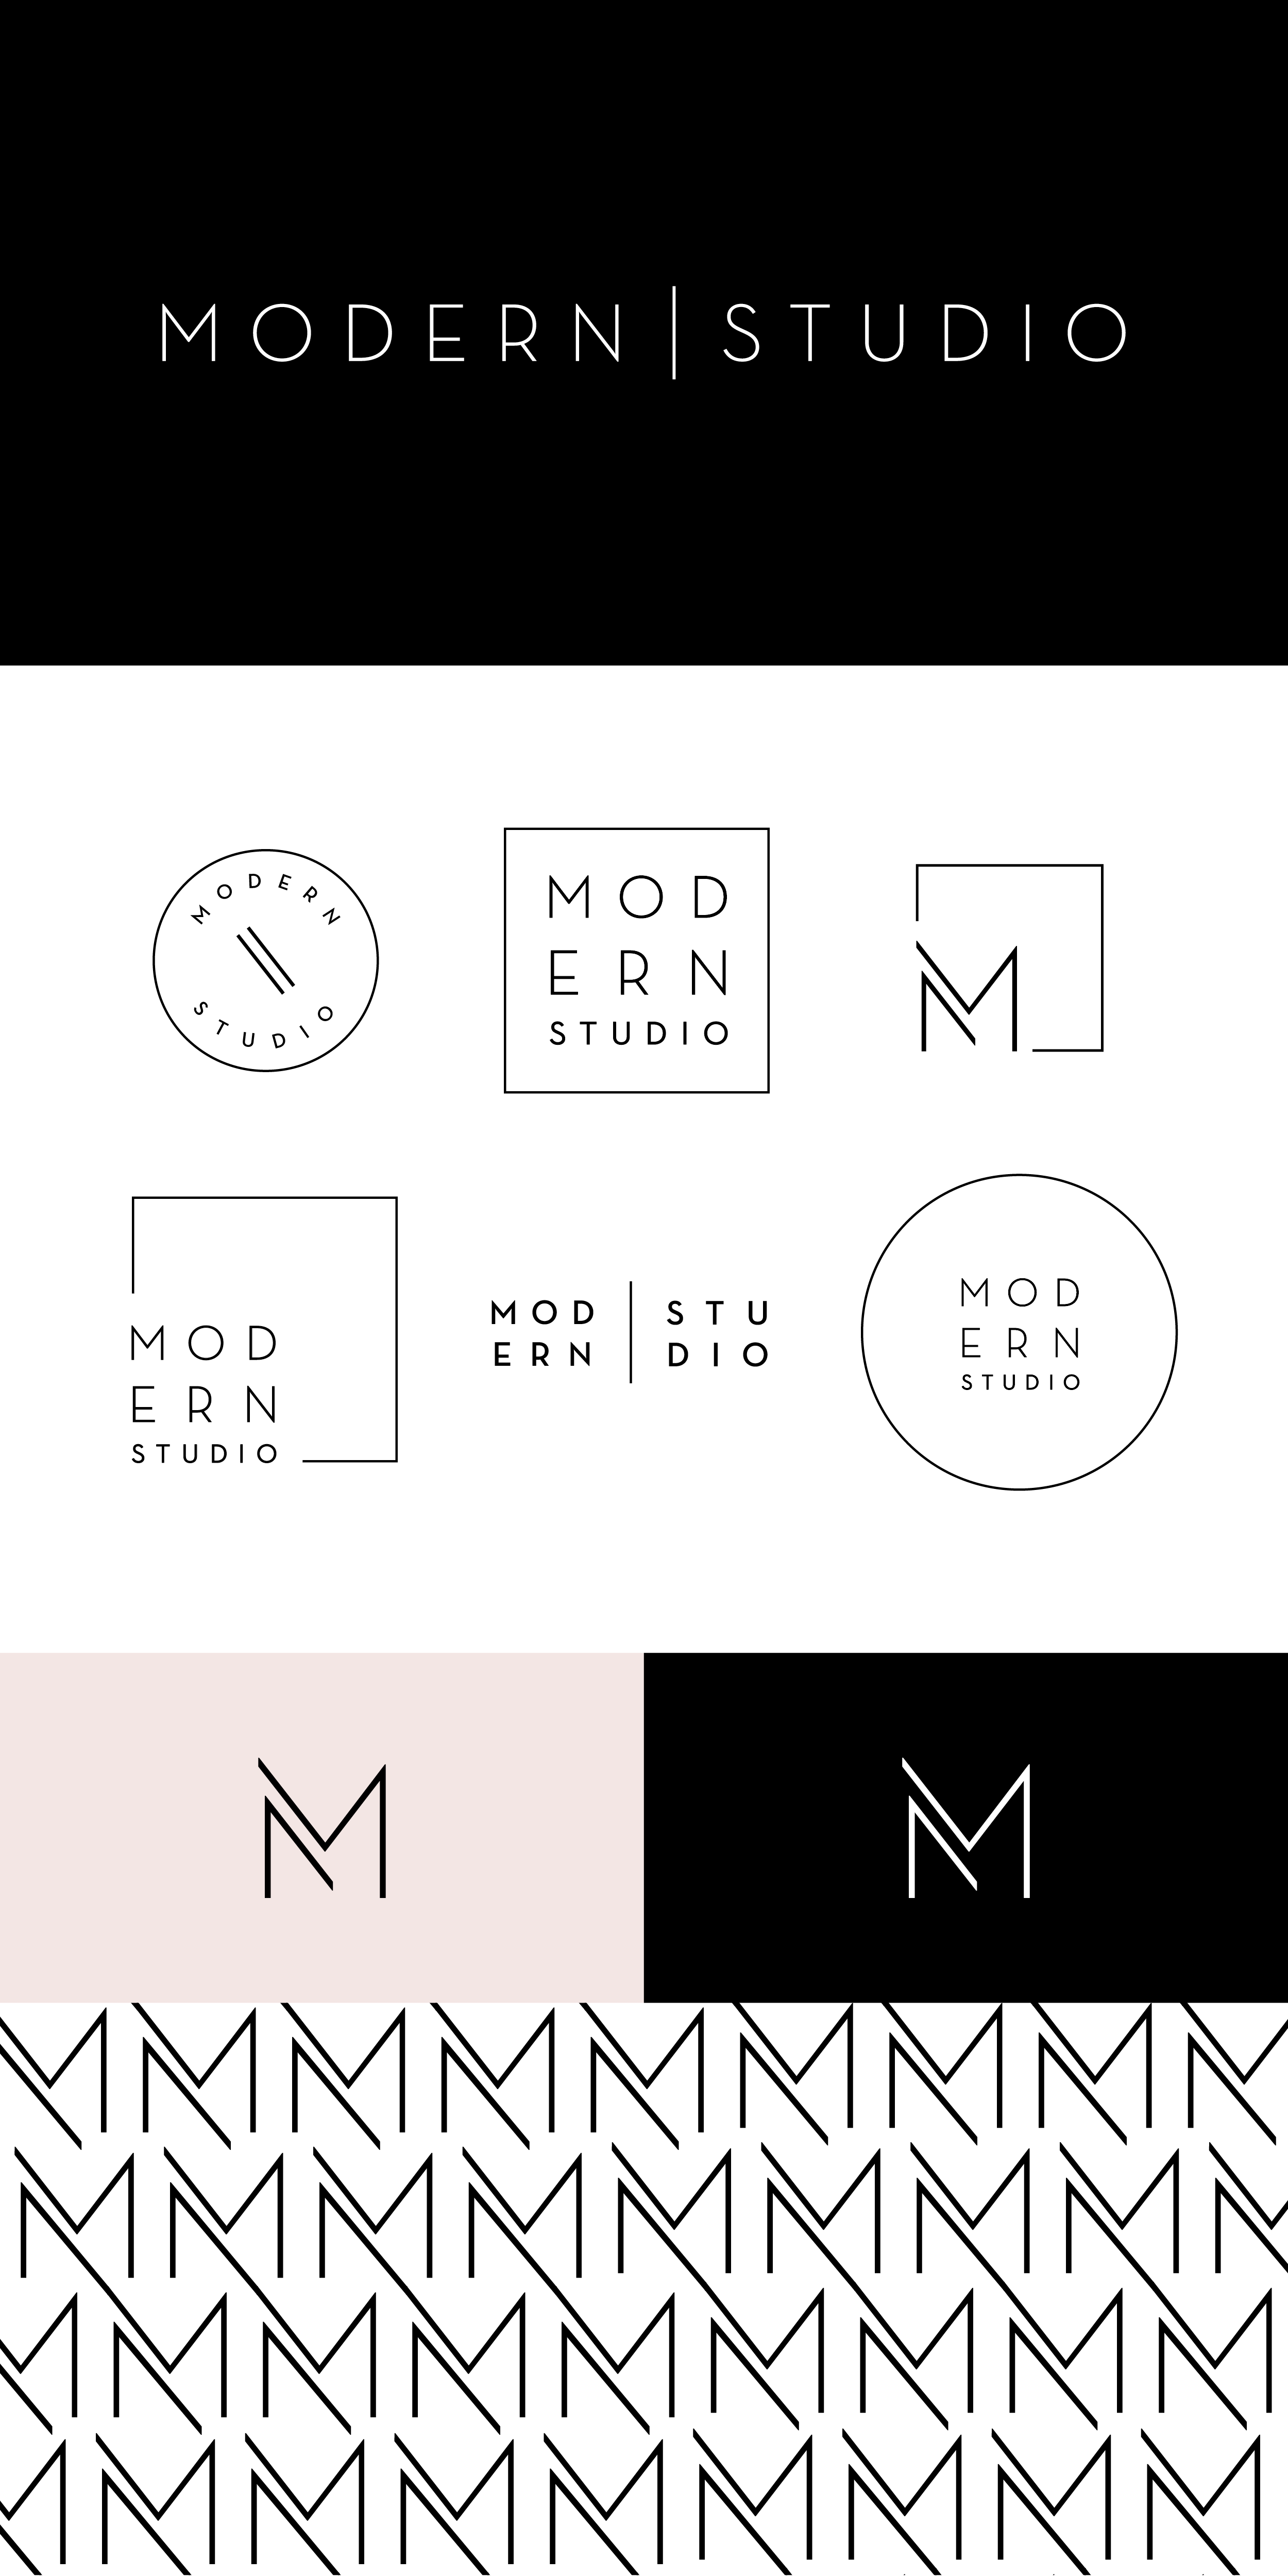 modern+studio+contemporary+branding+design+brand+logo+graphic+minimal+clean+elegant+simple+M+angles+linear+geometric+sharp+identity